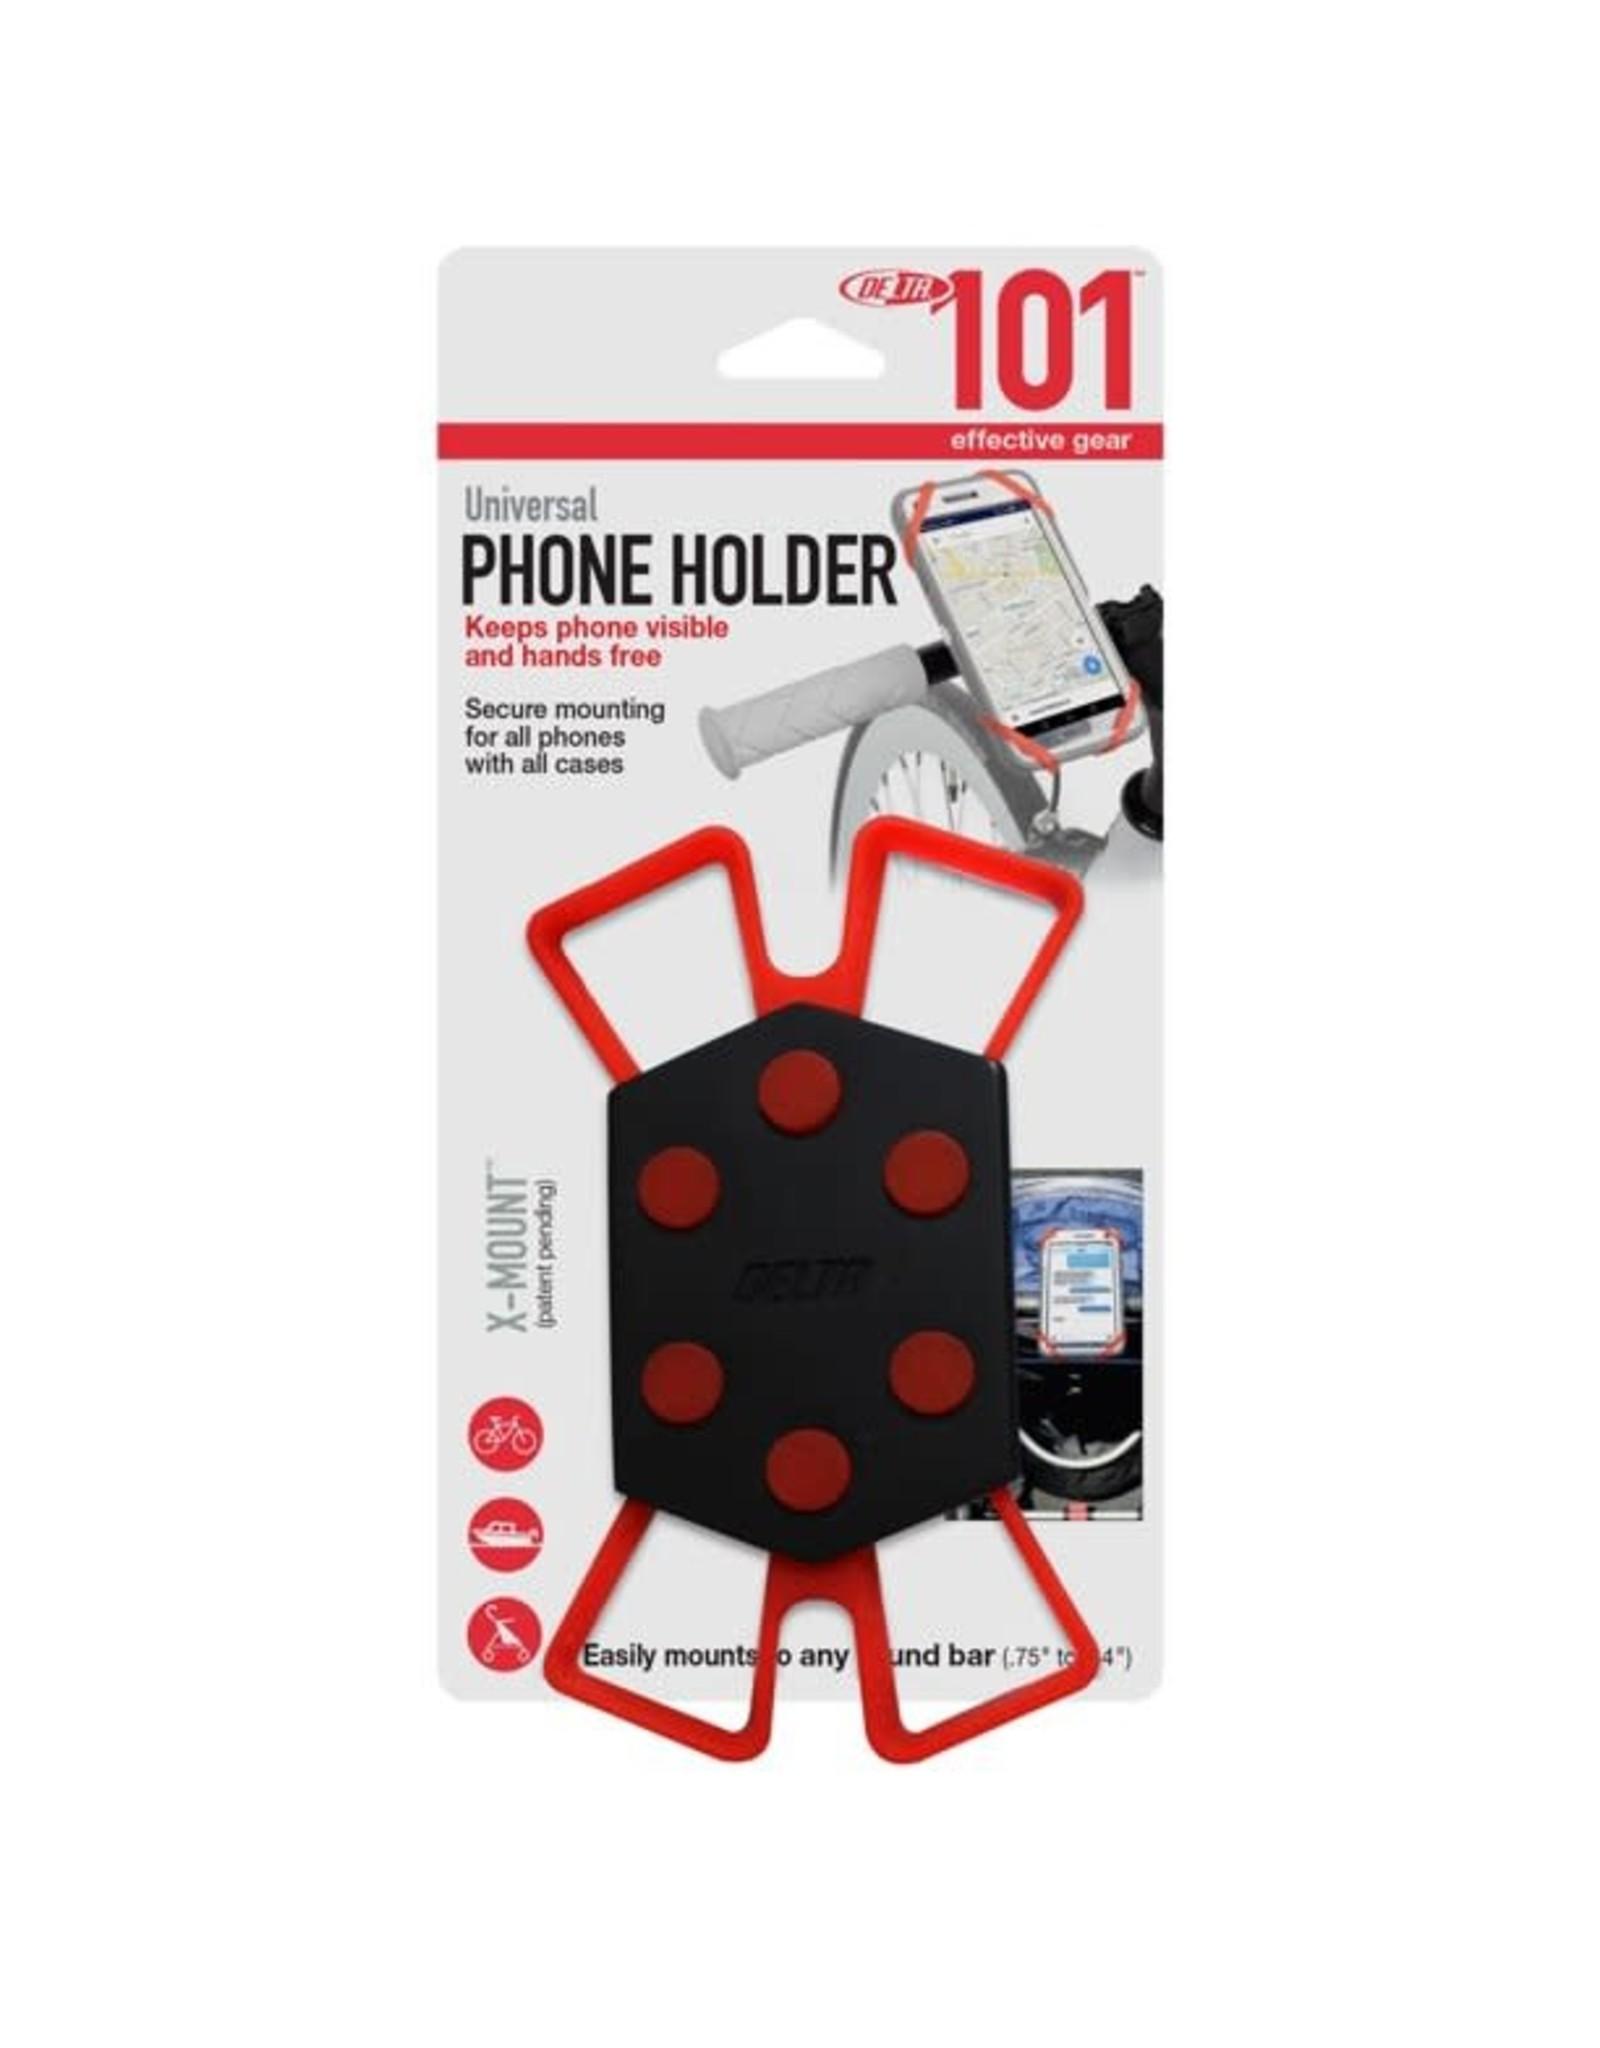 Delta Phone Delta X Mount Pro Universal Phone Holder Black/Red